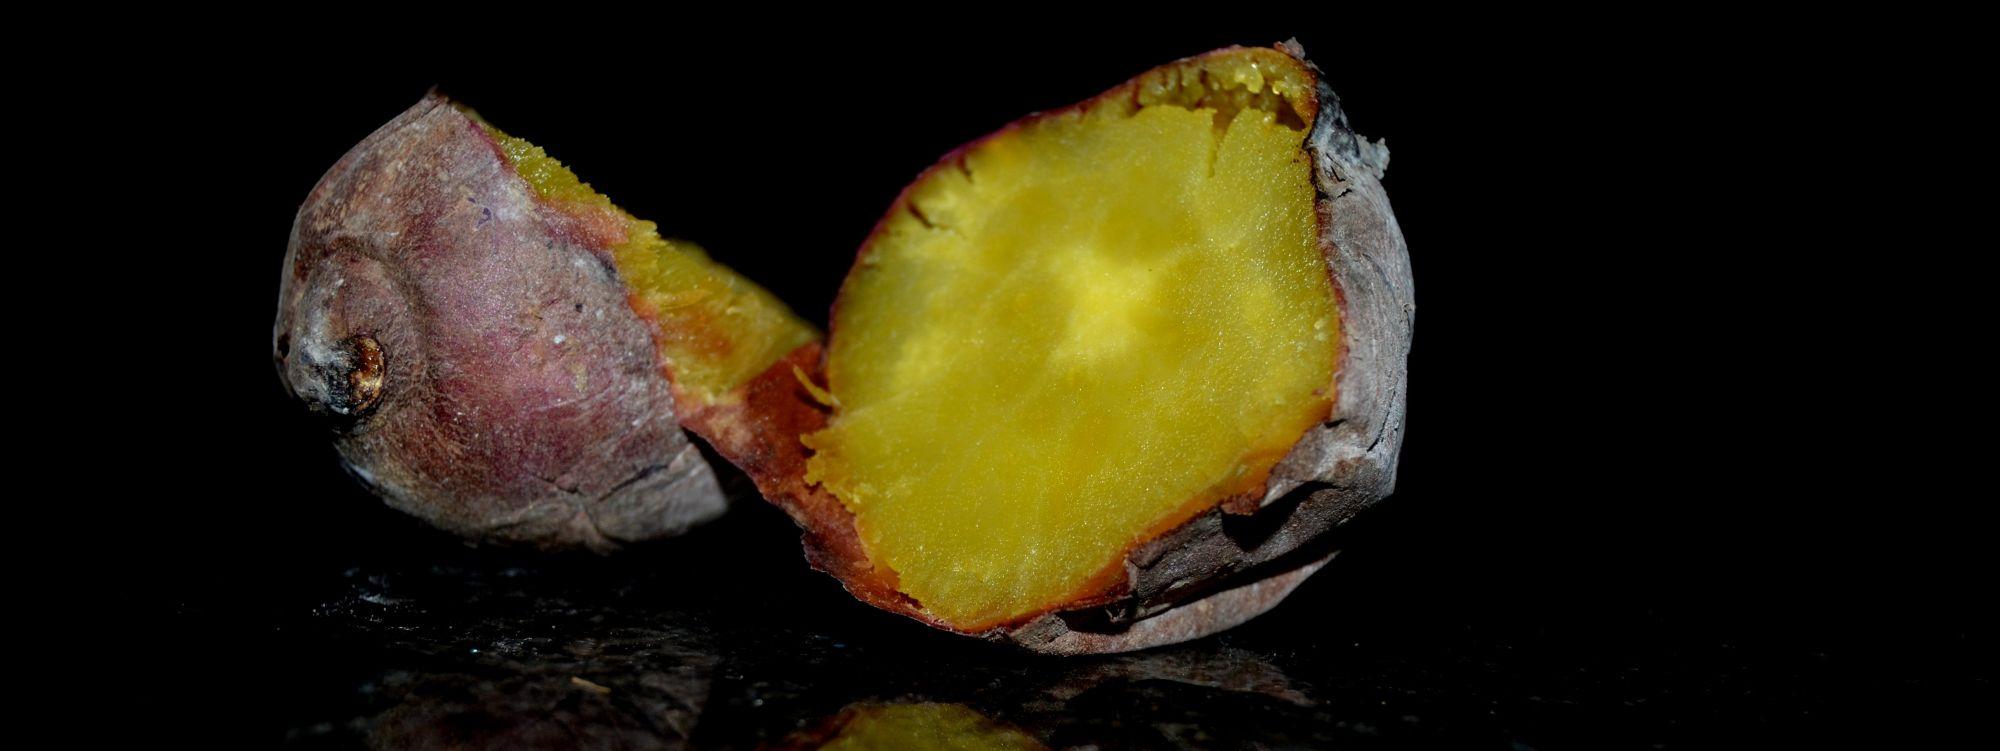 Batata-doce de Aljezur